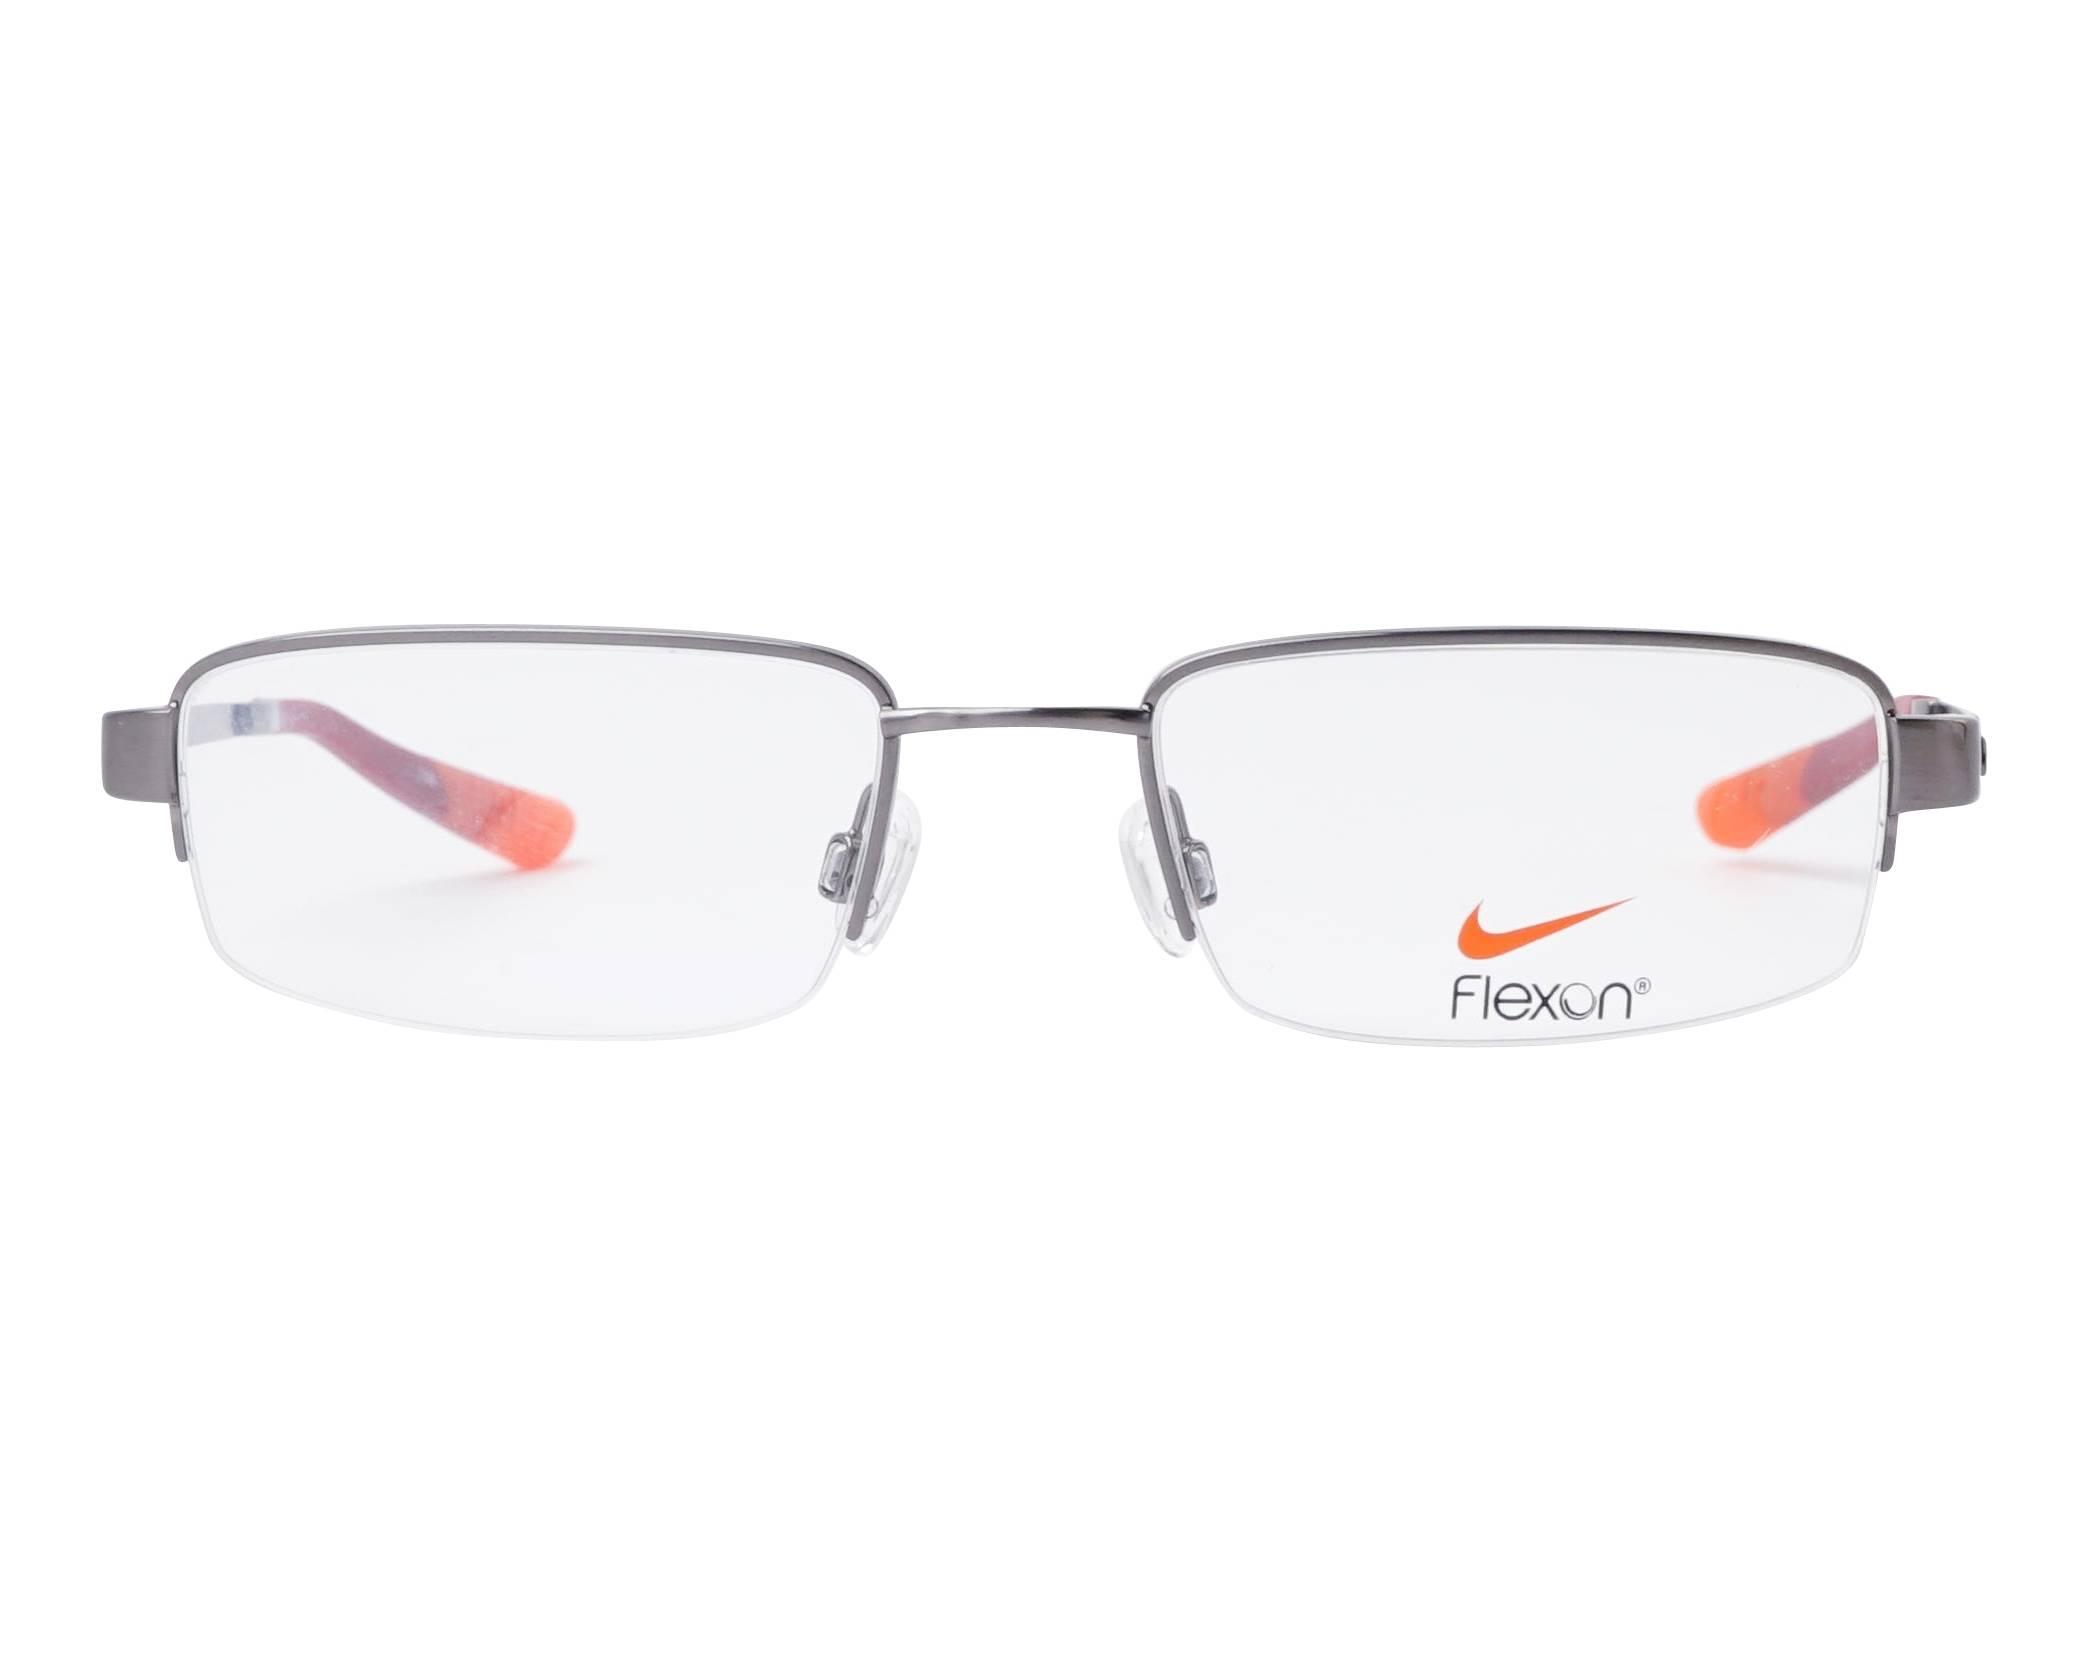 de3a0d2cdefd eyeglasses Nike 4271 035 51-19 Gun front view